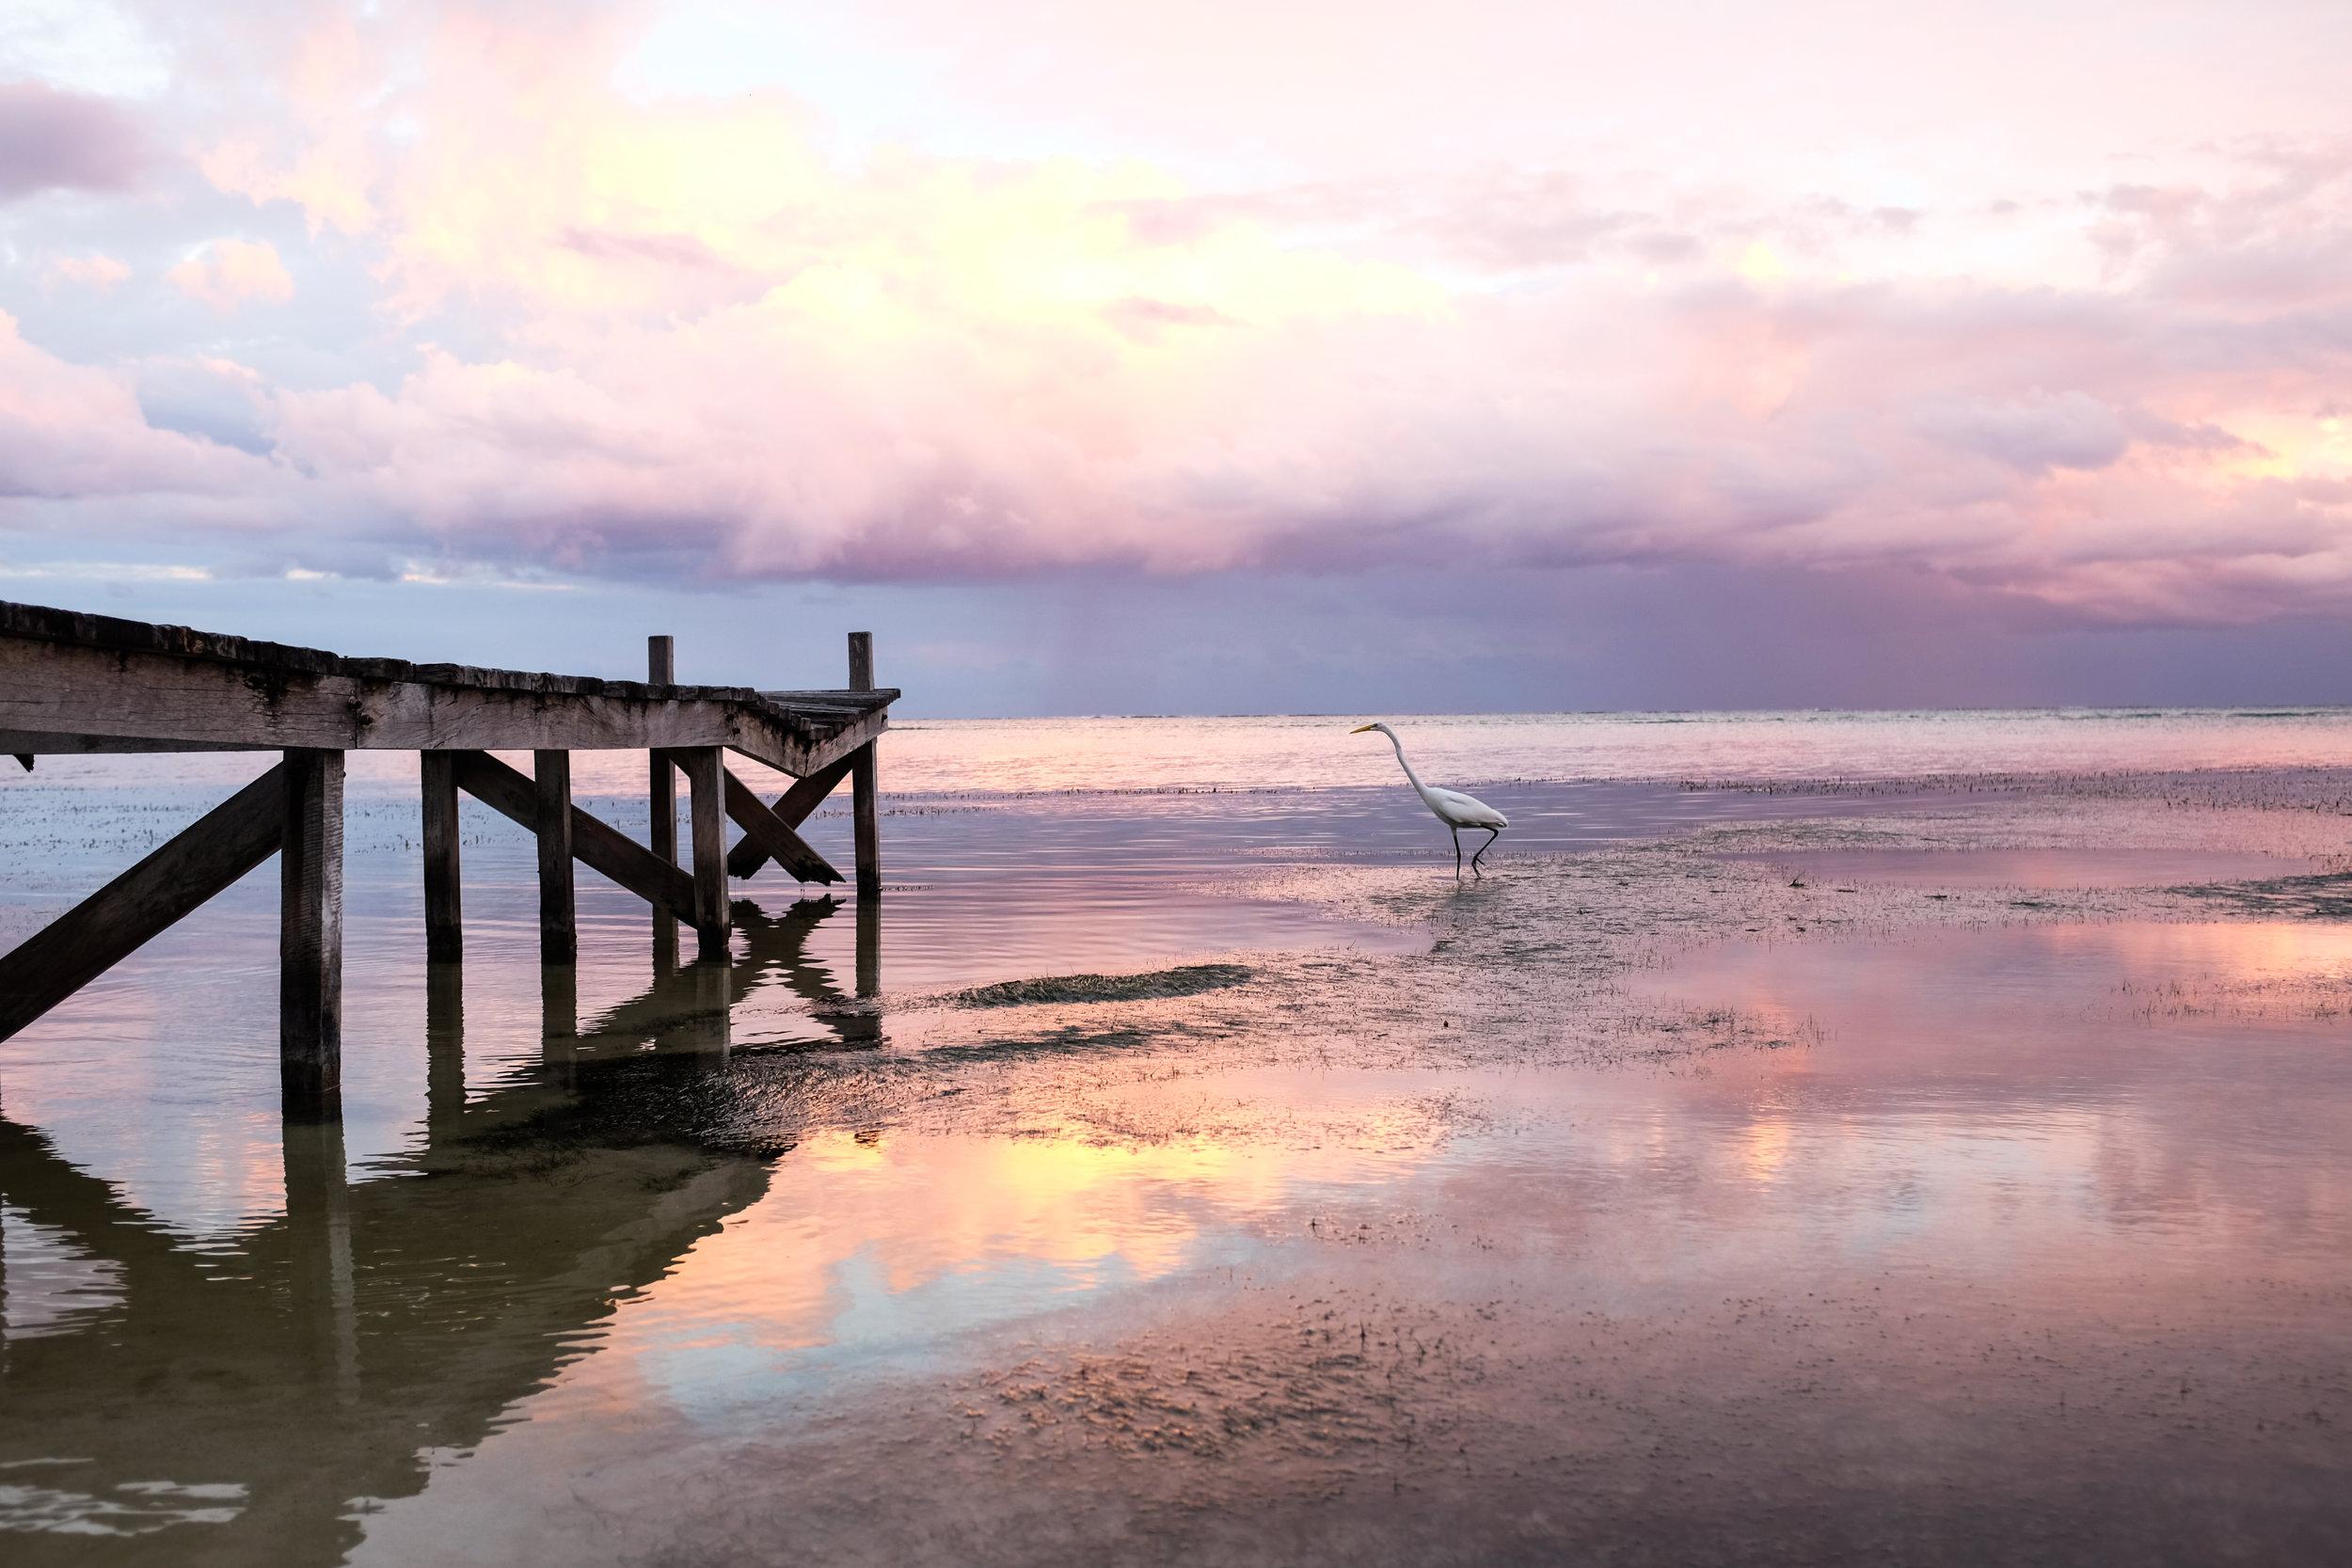 Belize-3493.jpg